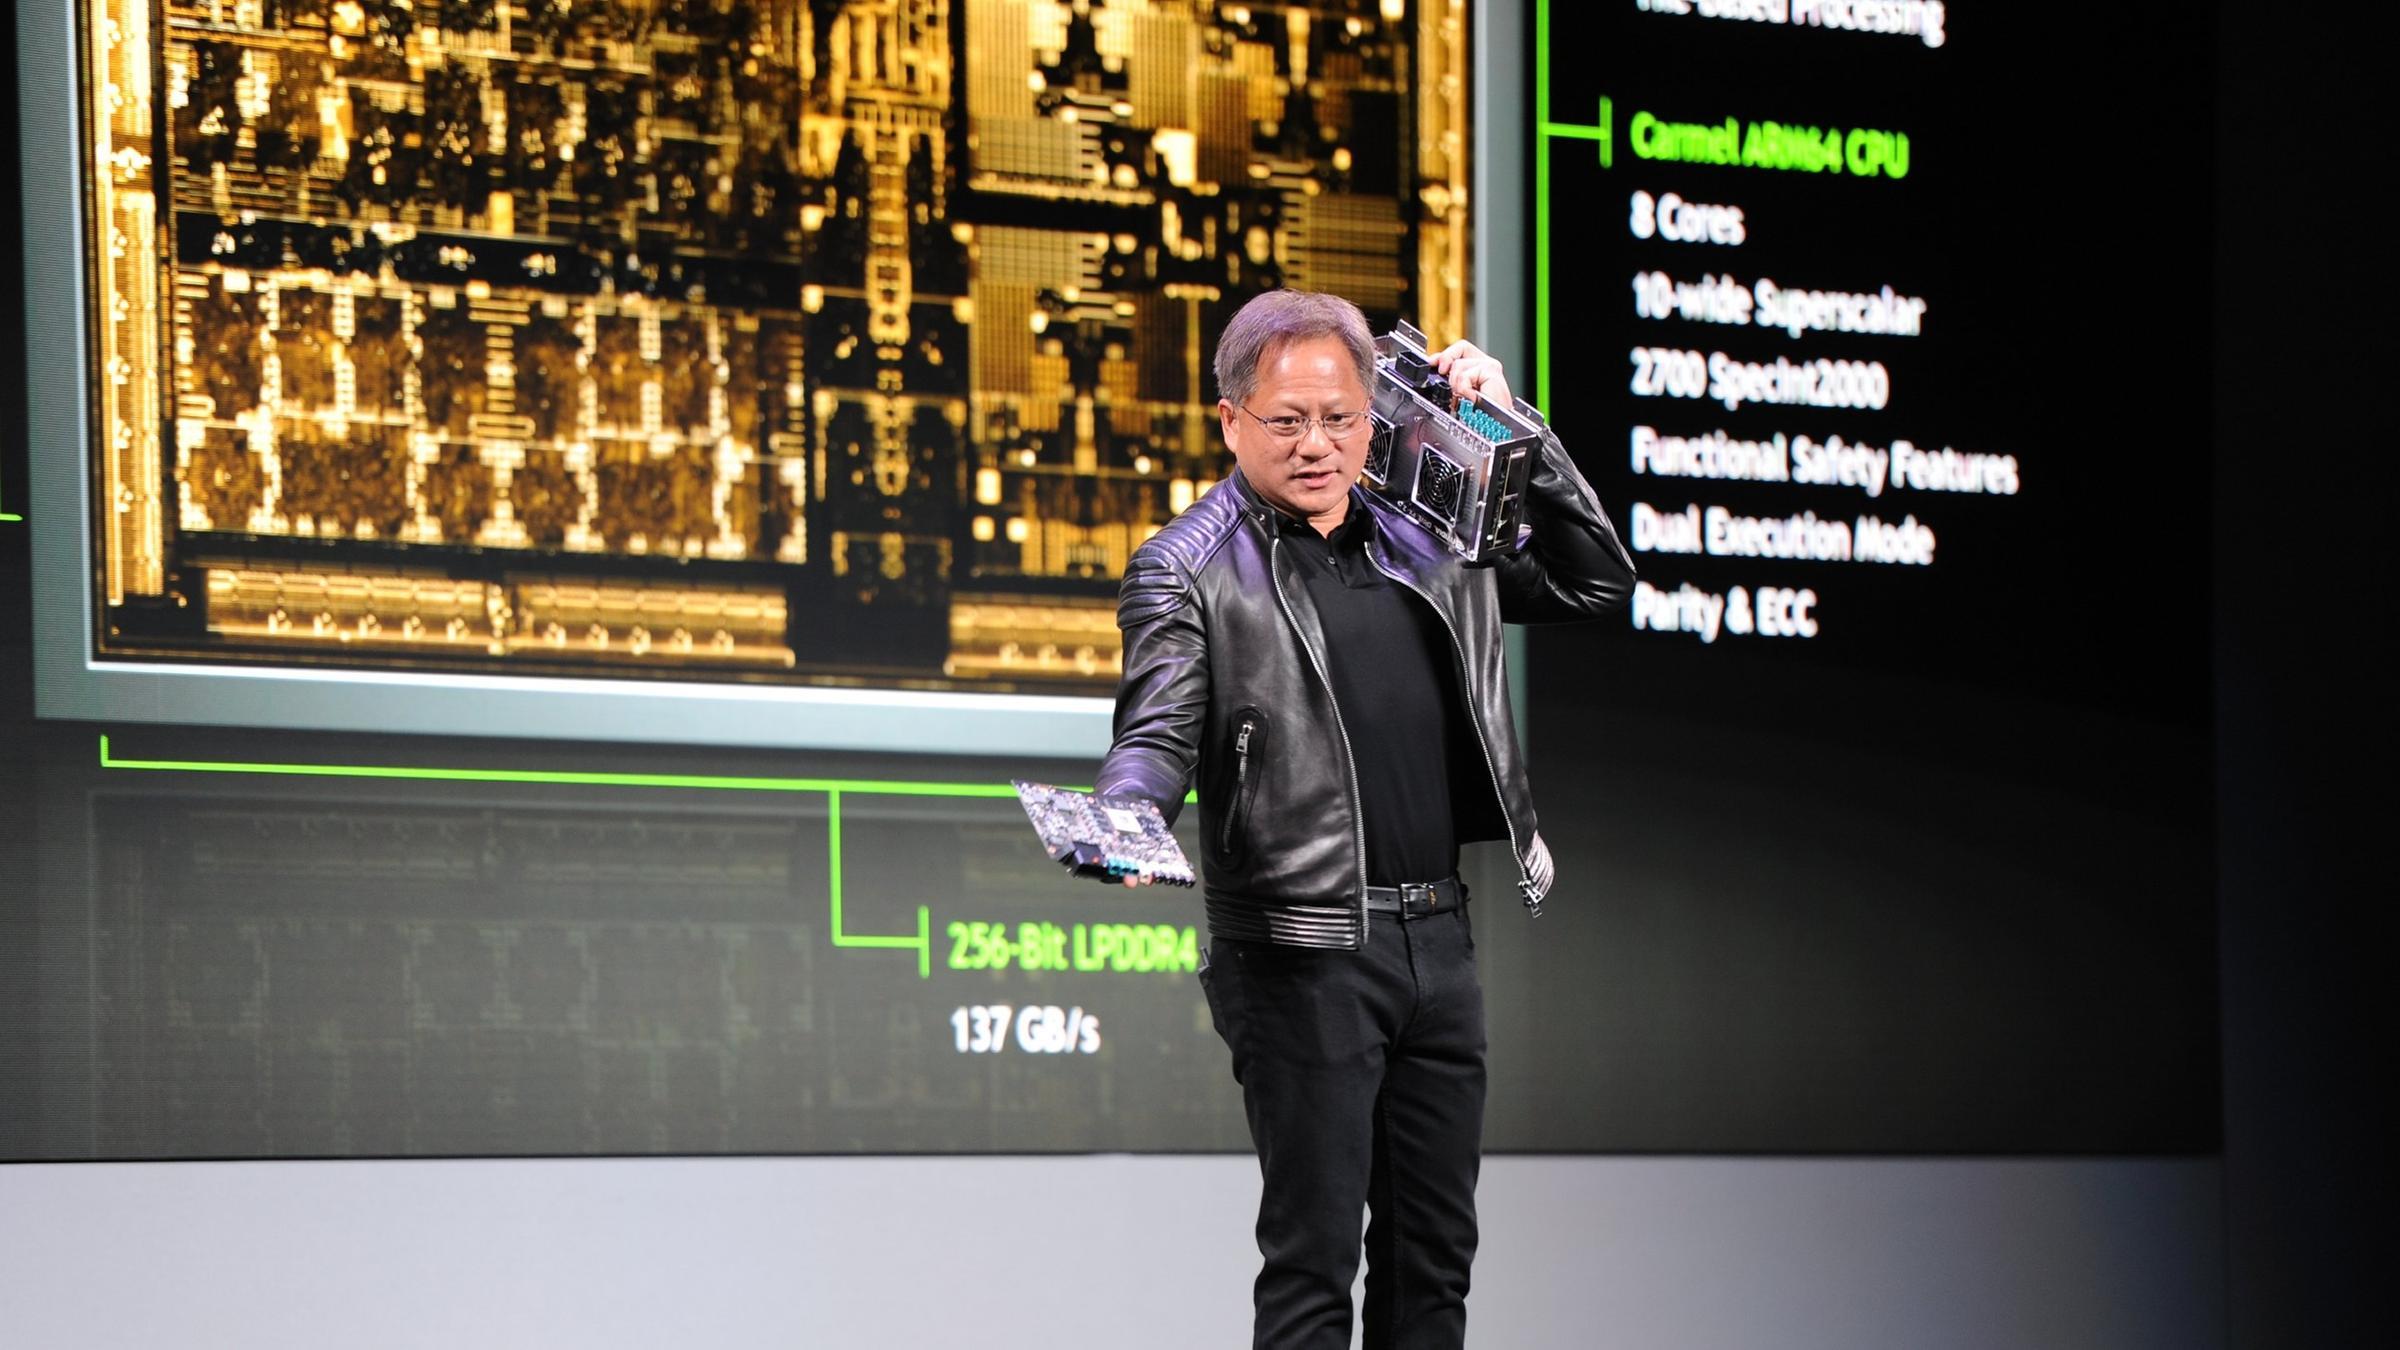 Nach tödlichem Uber-Unfall: Nvidia stoppt Roboterautotests